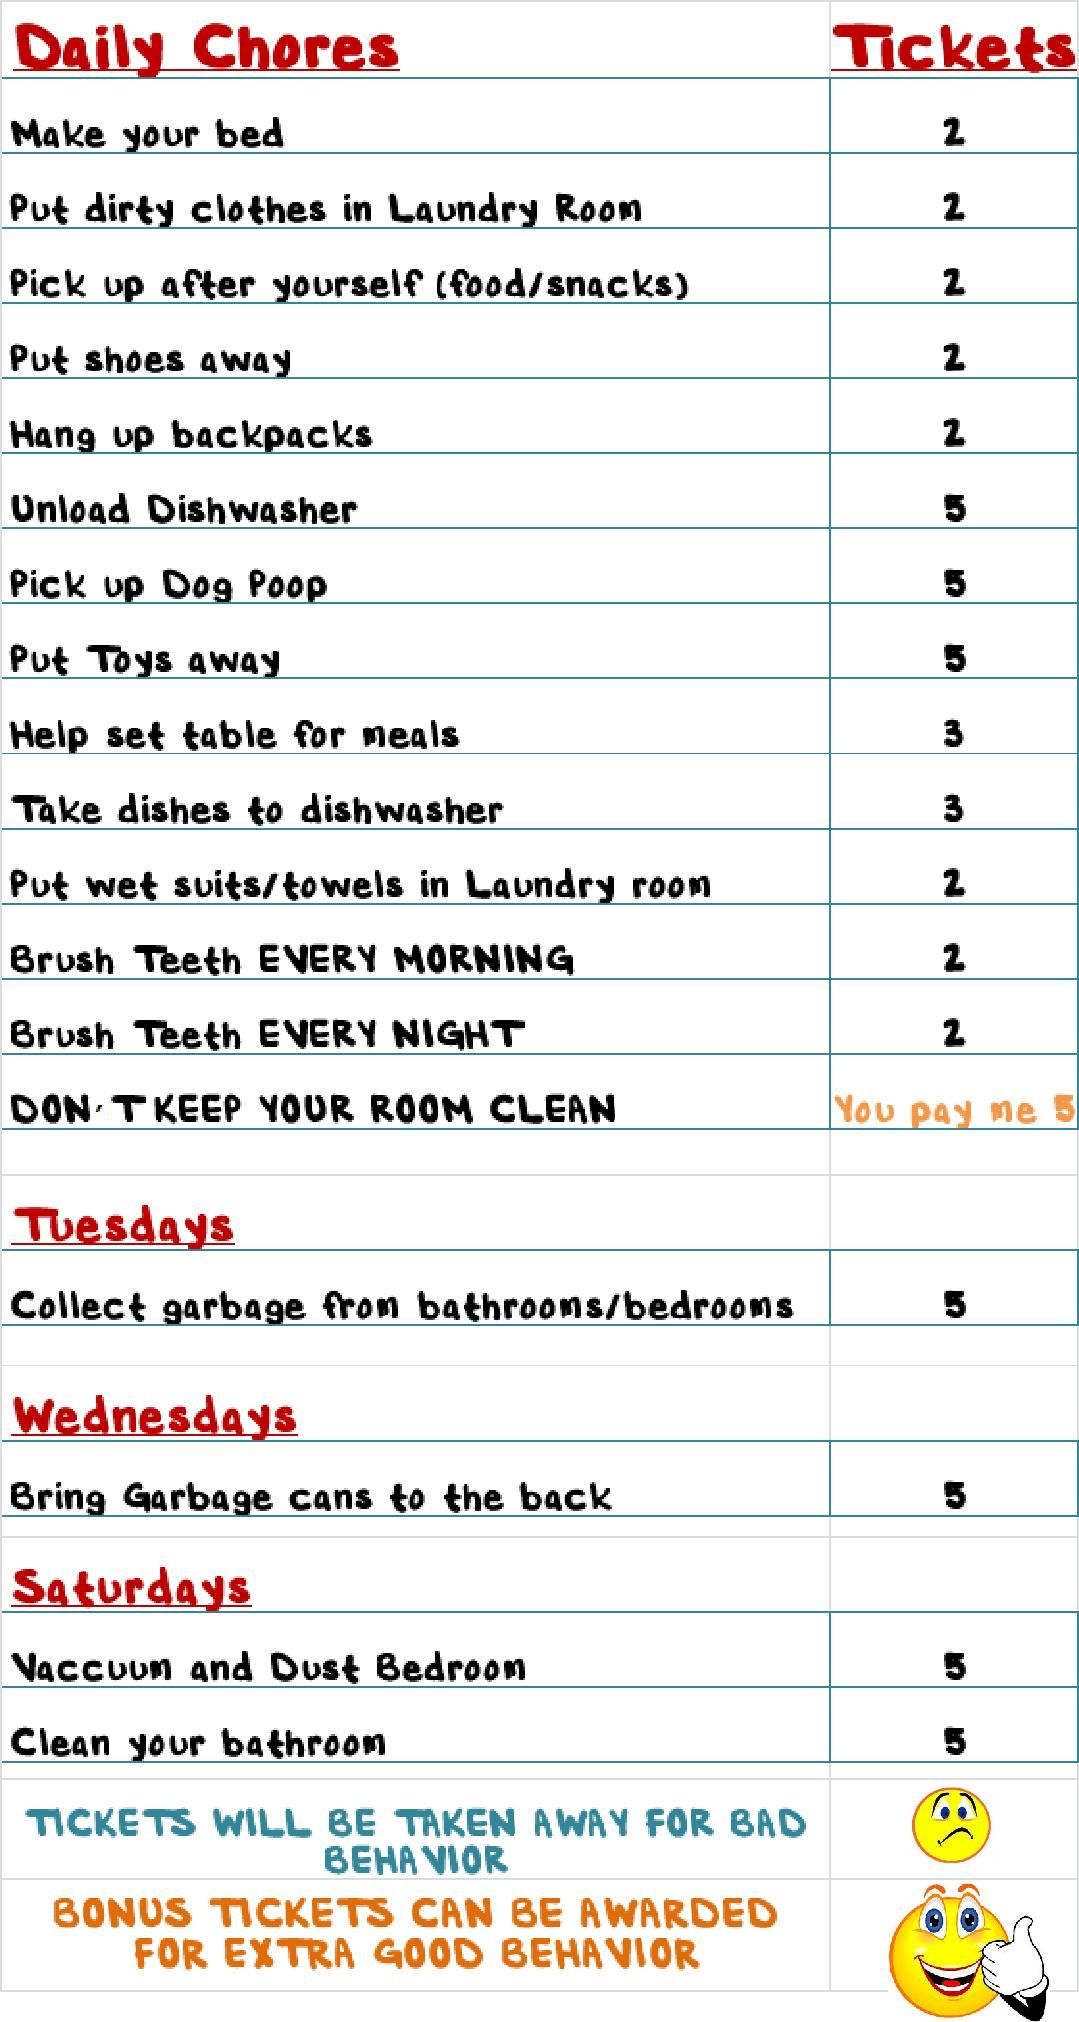 Encourage Chores For Kids Good Behavior Helping Ticket